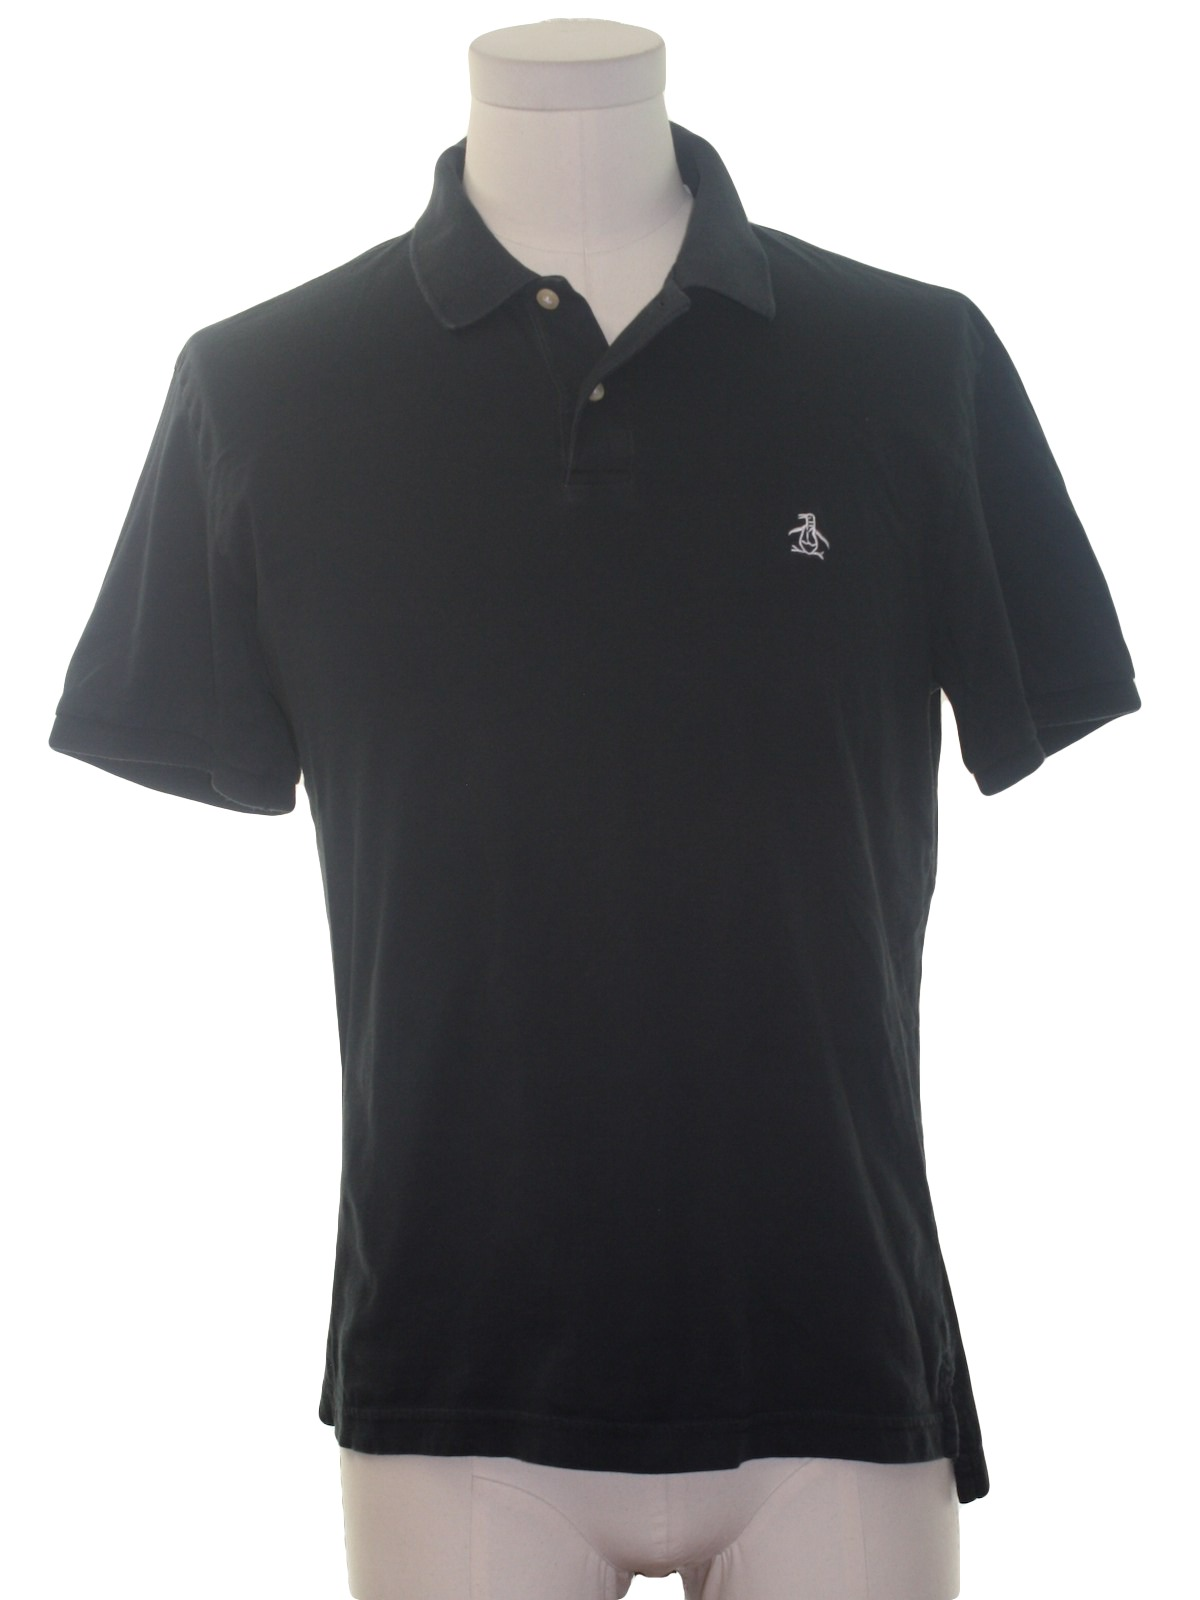 shirt 90s penguin by munsingwear mens navy cotton short